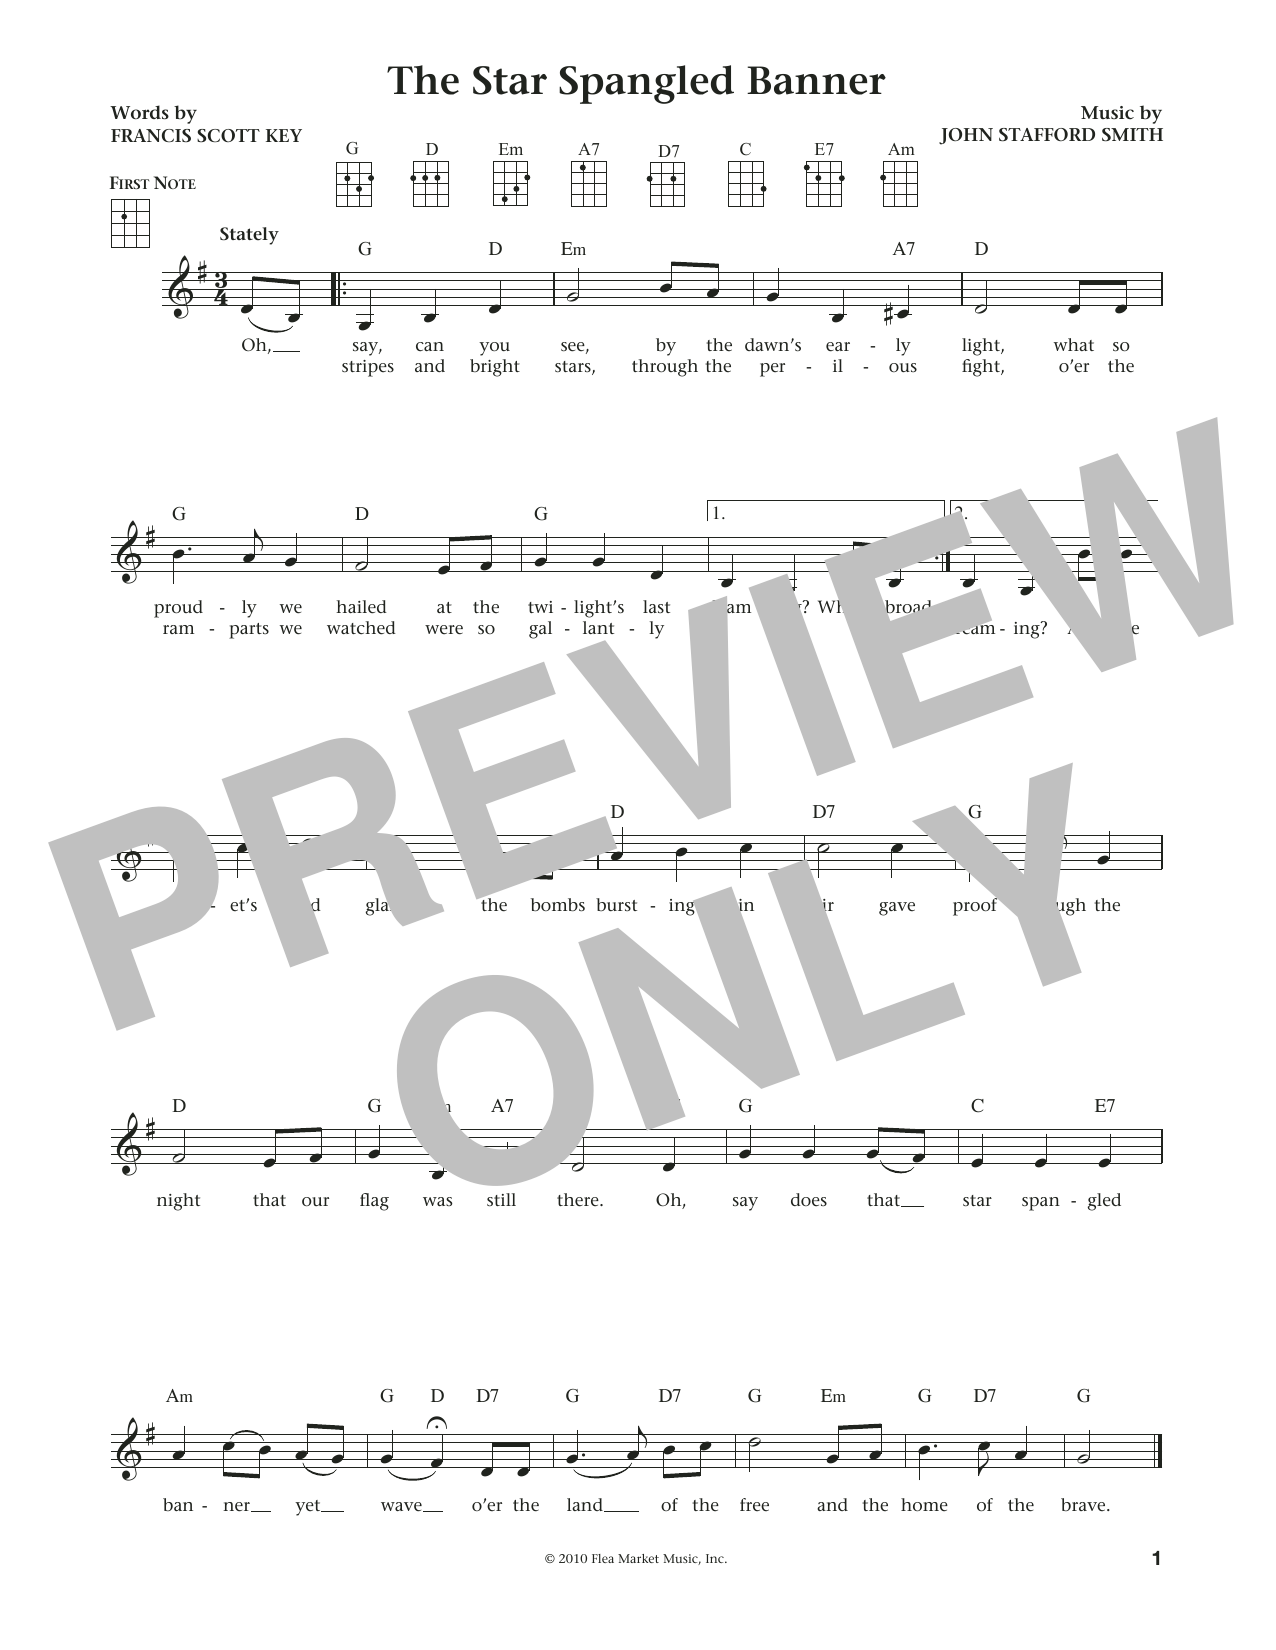 Francis Scott Key The Star Spangled Banner From The Daily Ukulele Arr Liz And Jim Beloff Sheet Music Pdf Notes Chords Holiday Score Ukulele Download Printable Sku 184104